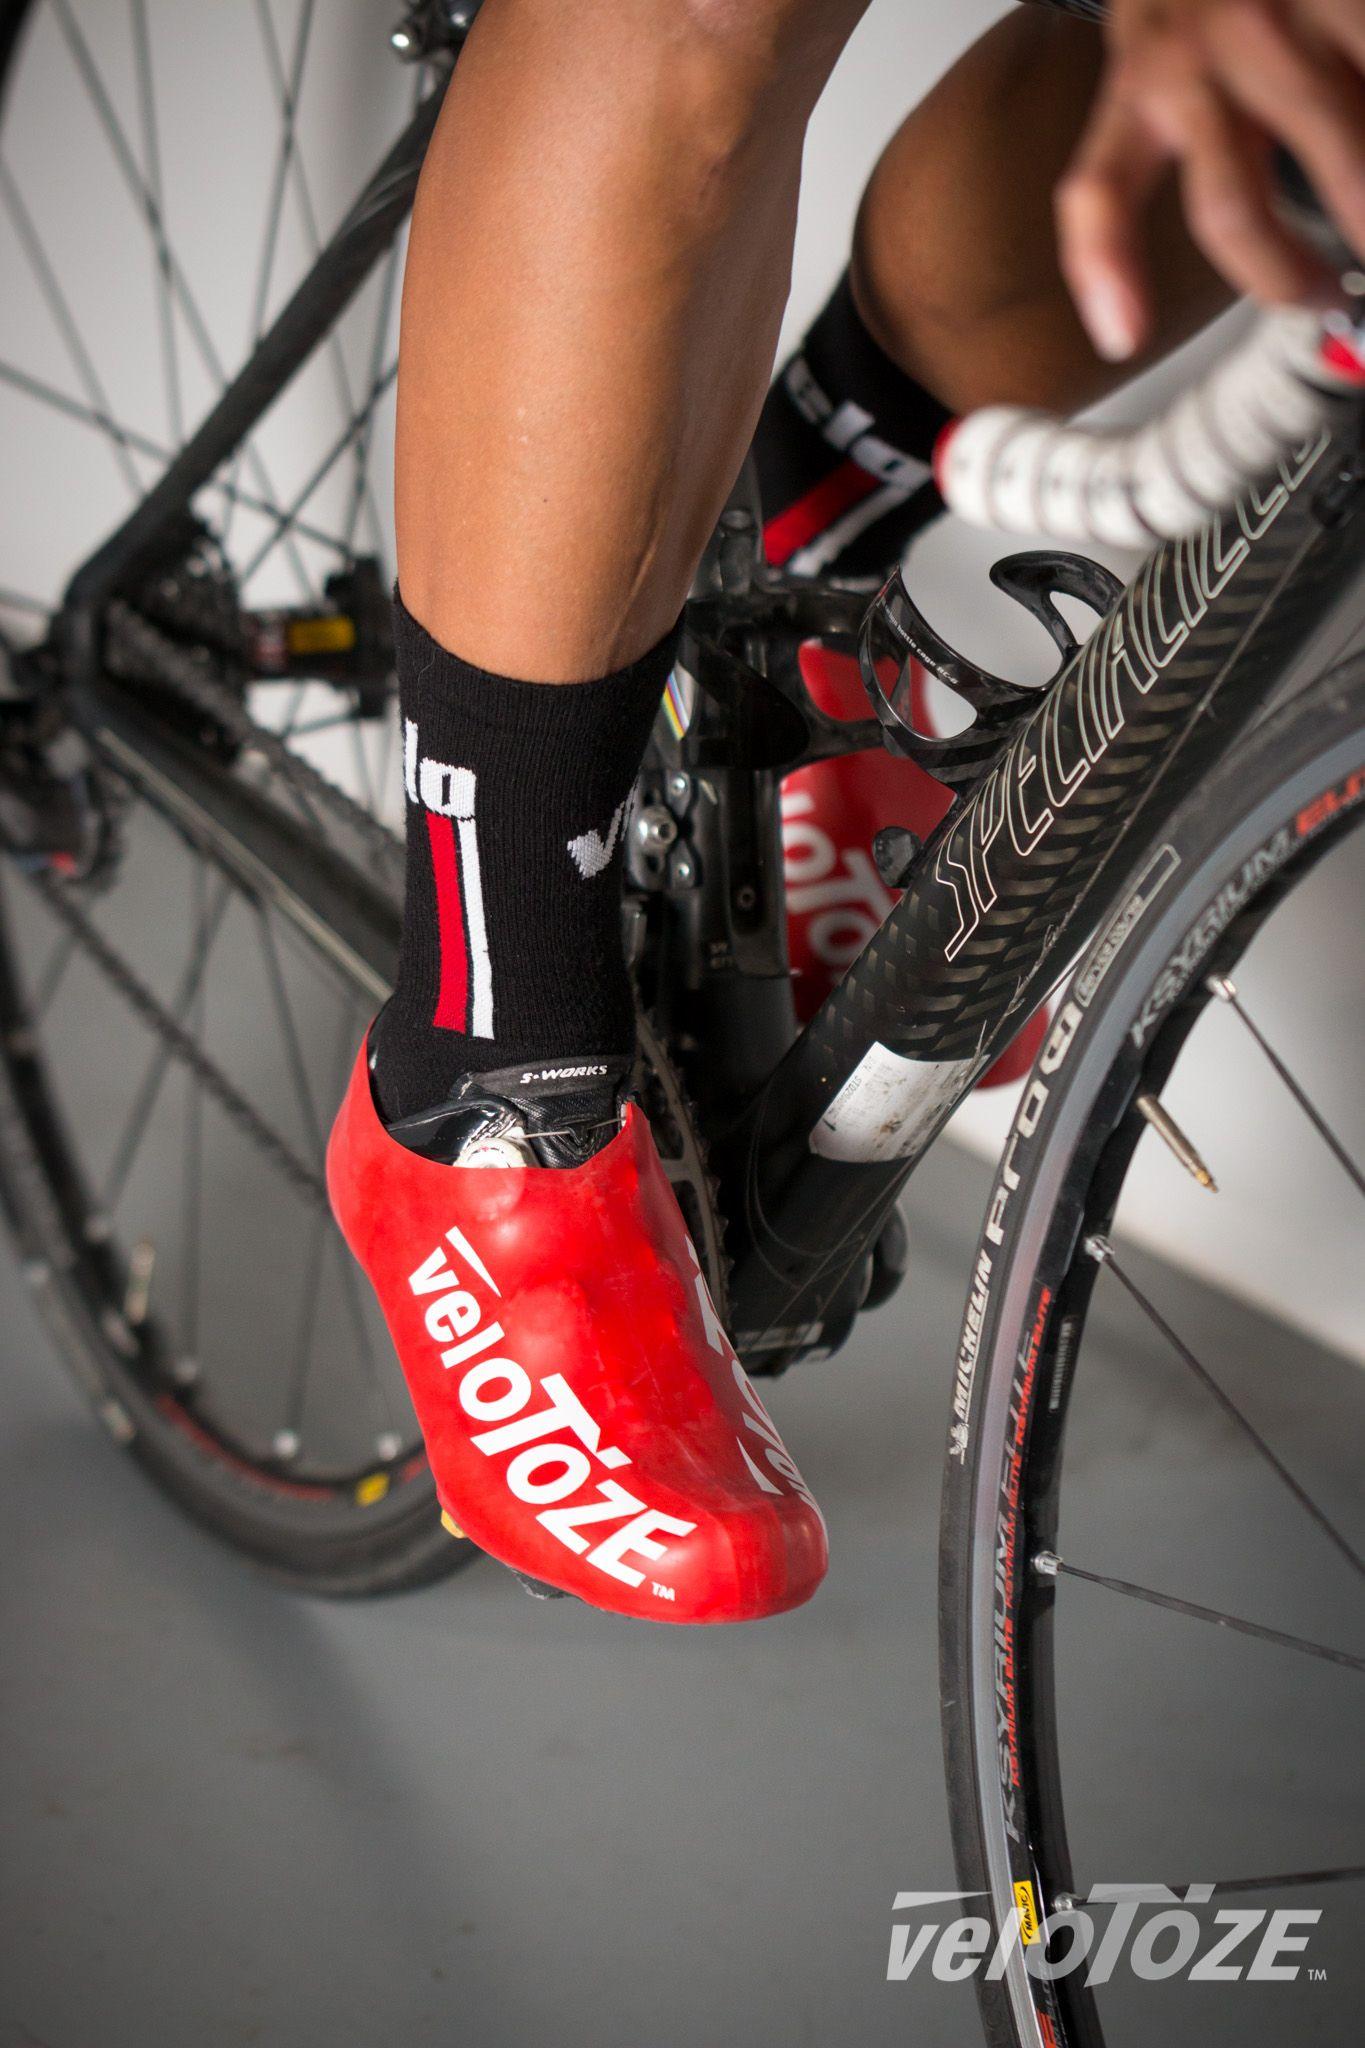 Pin on veloToze - Shoe Covers